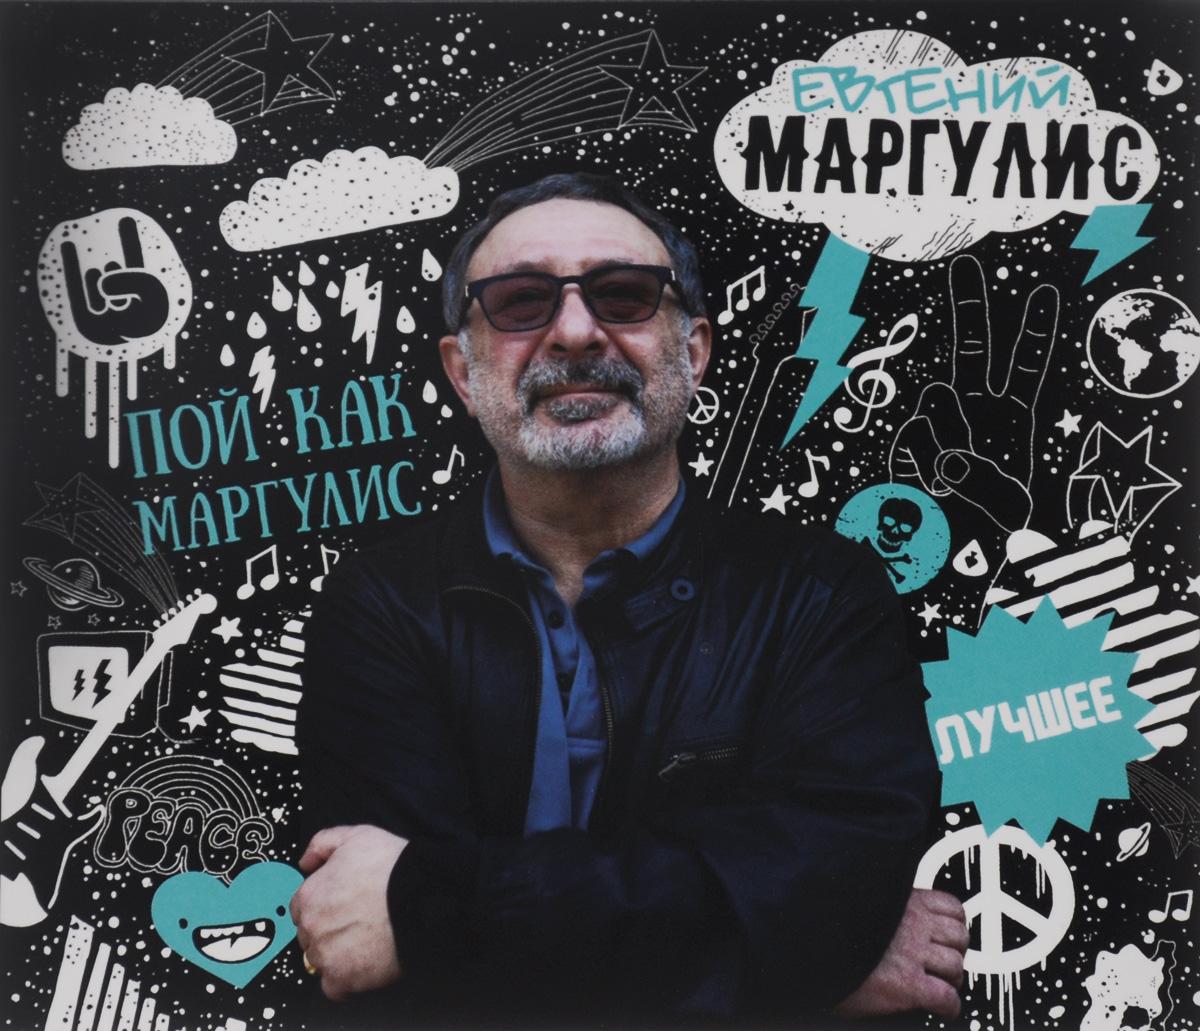 Евгений Маргулис Евгений Маргулис. Пой как Маргулис евгений маргулис 2017 06 08t20 30